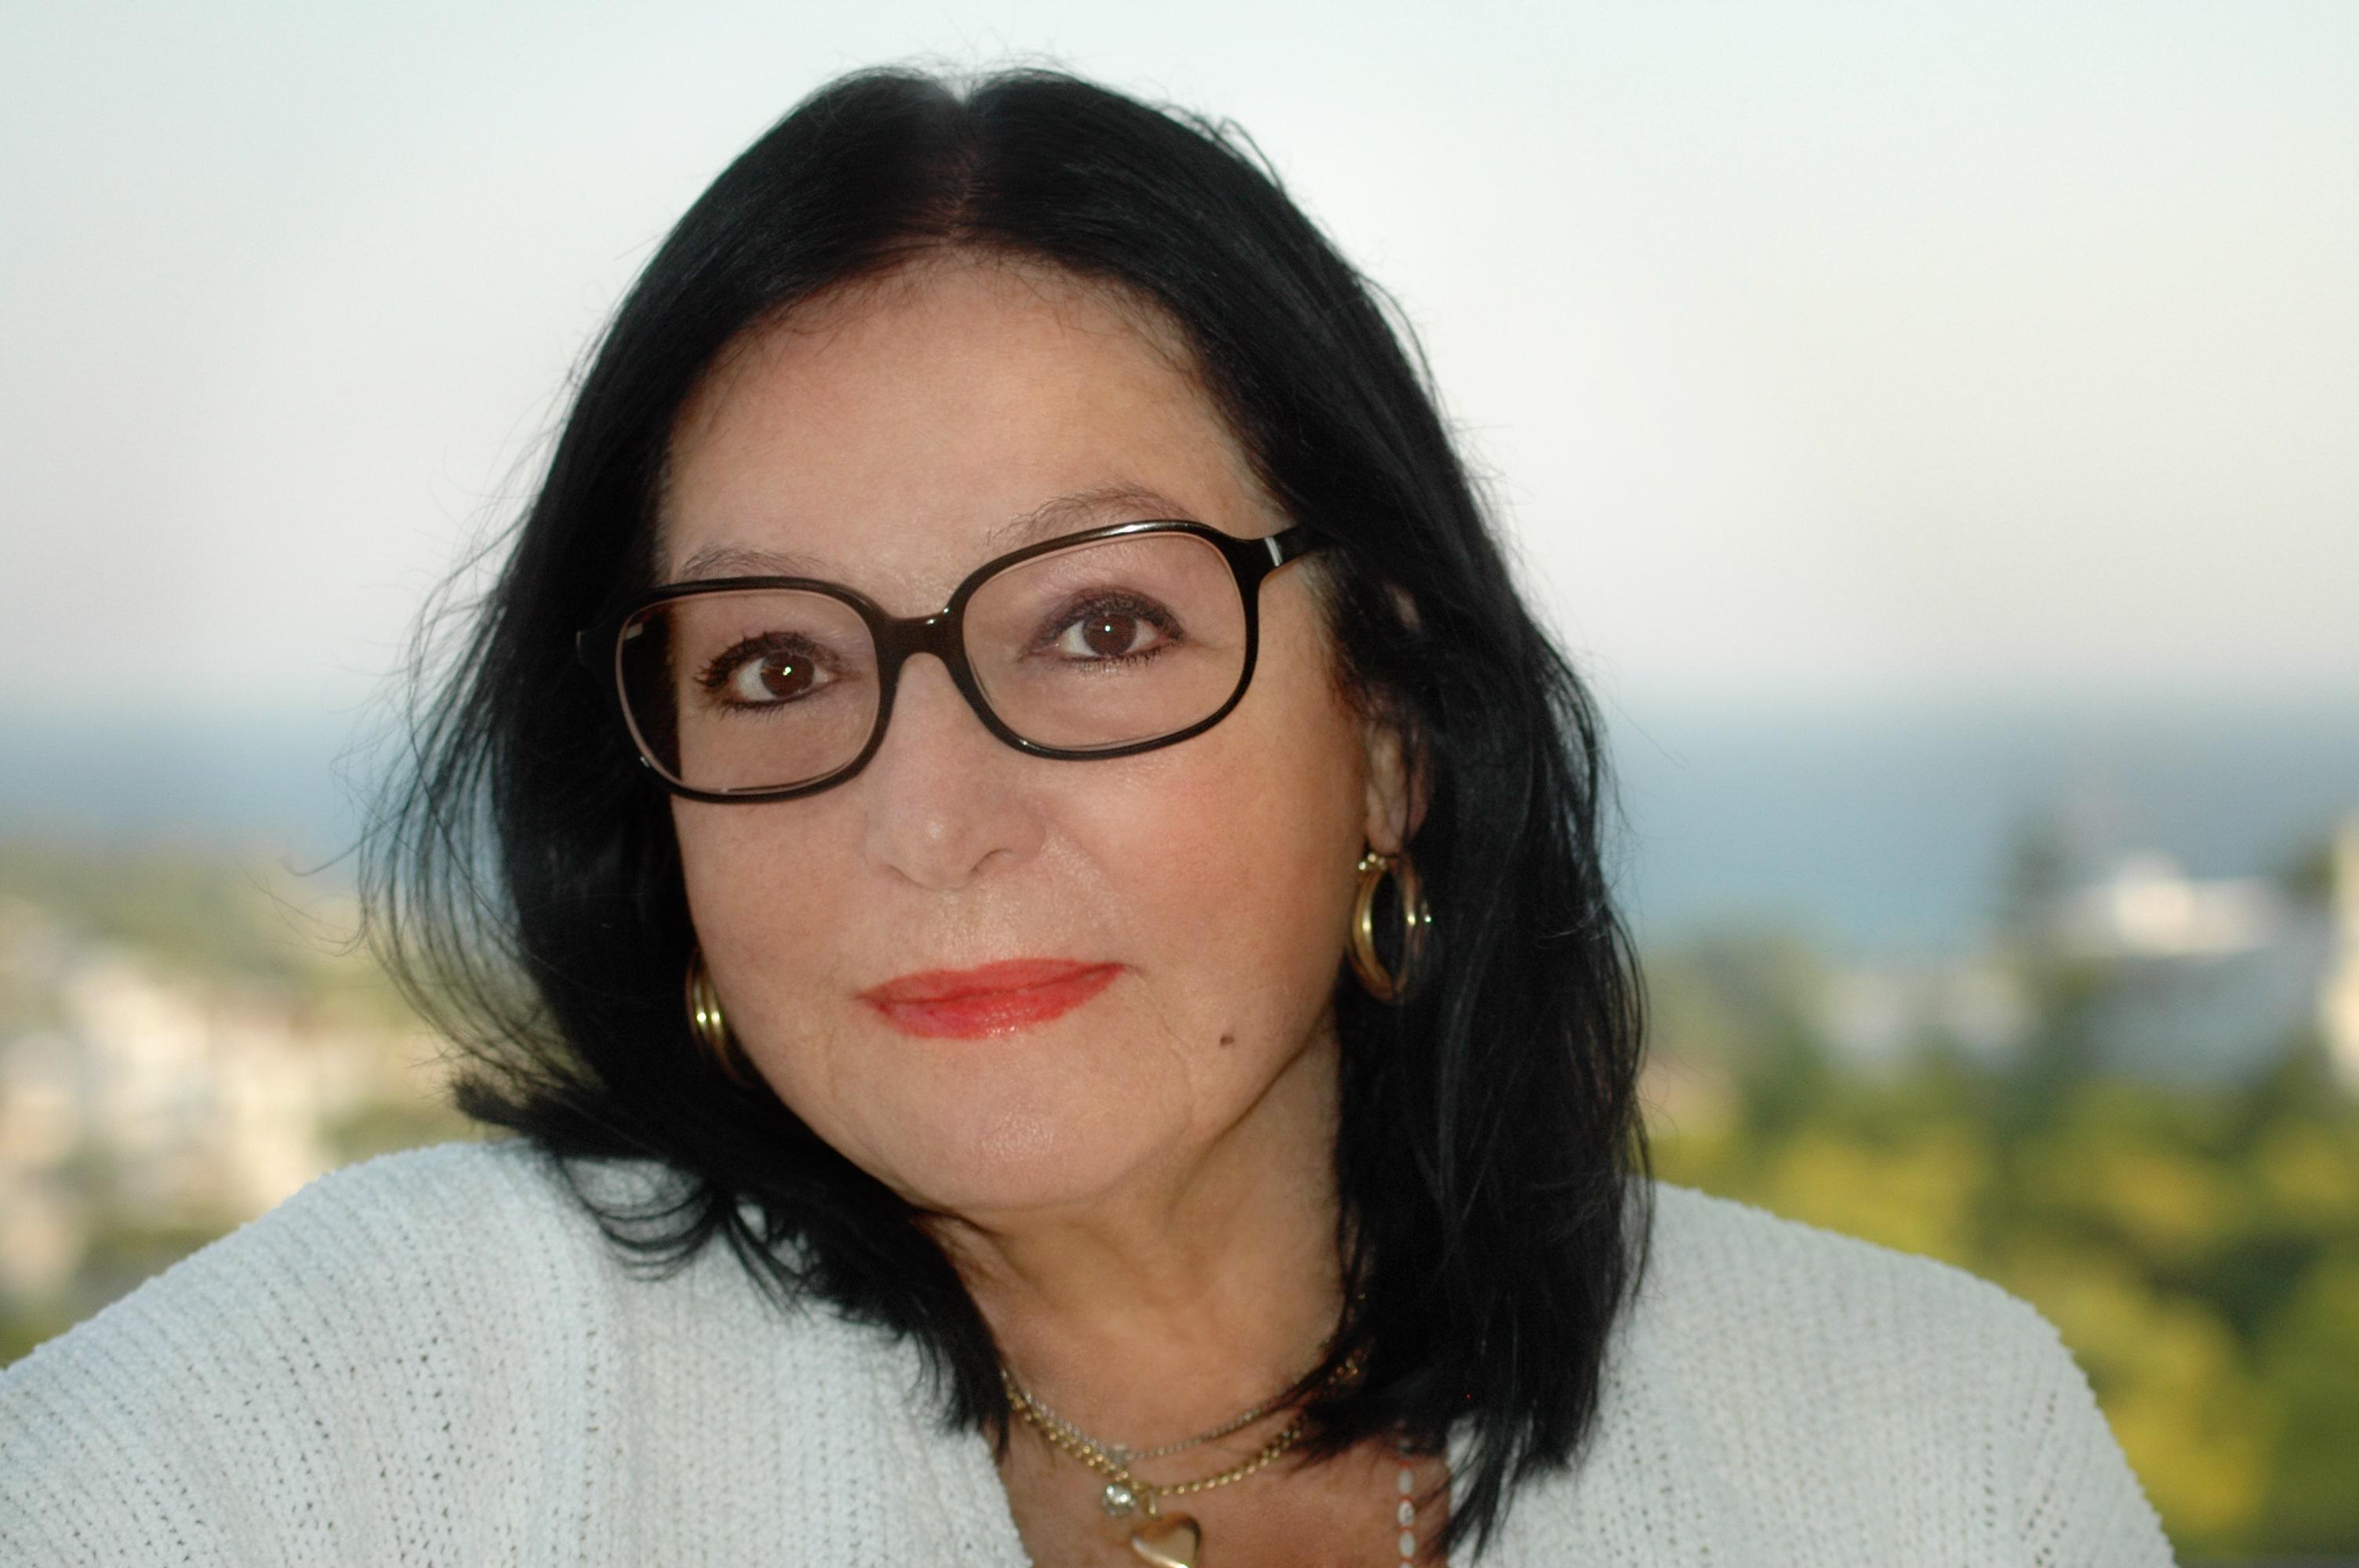 Nana Mouskouri - The Exquisite Nana Mouskouri